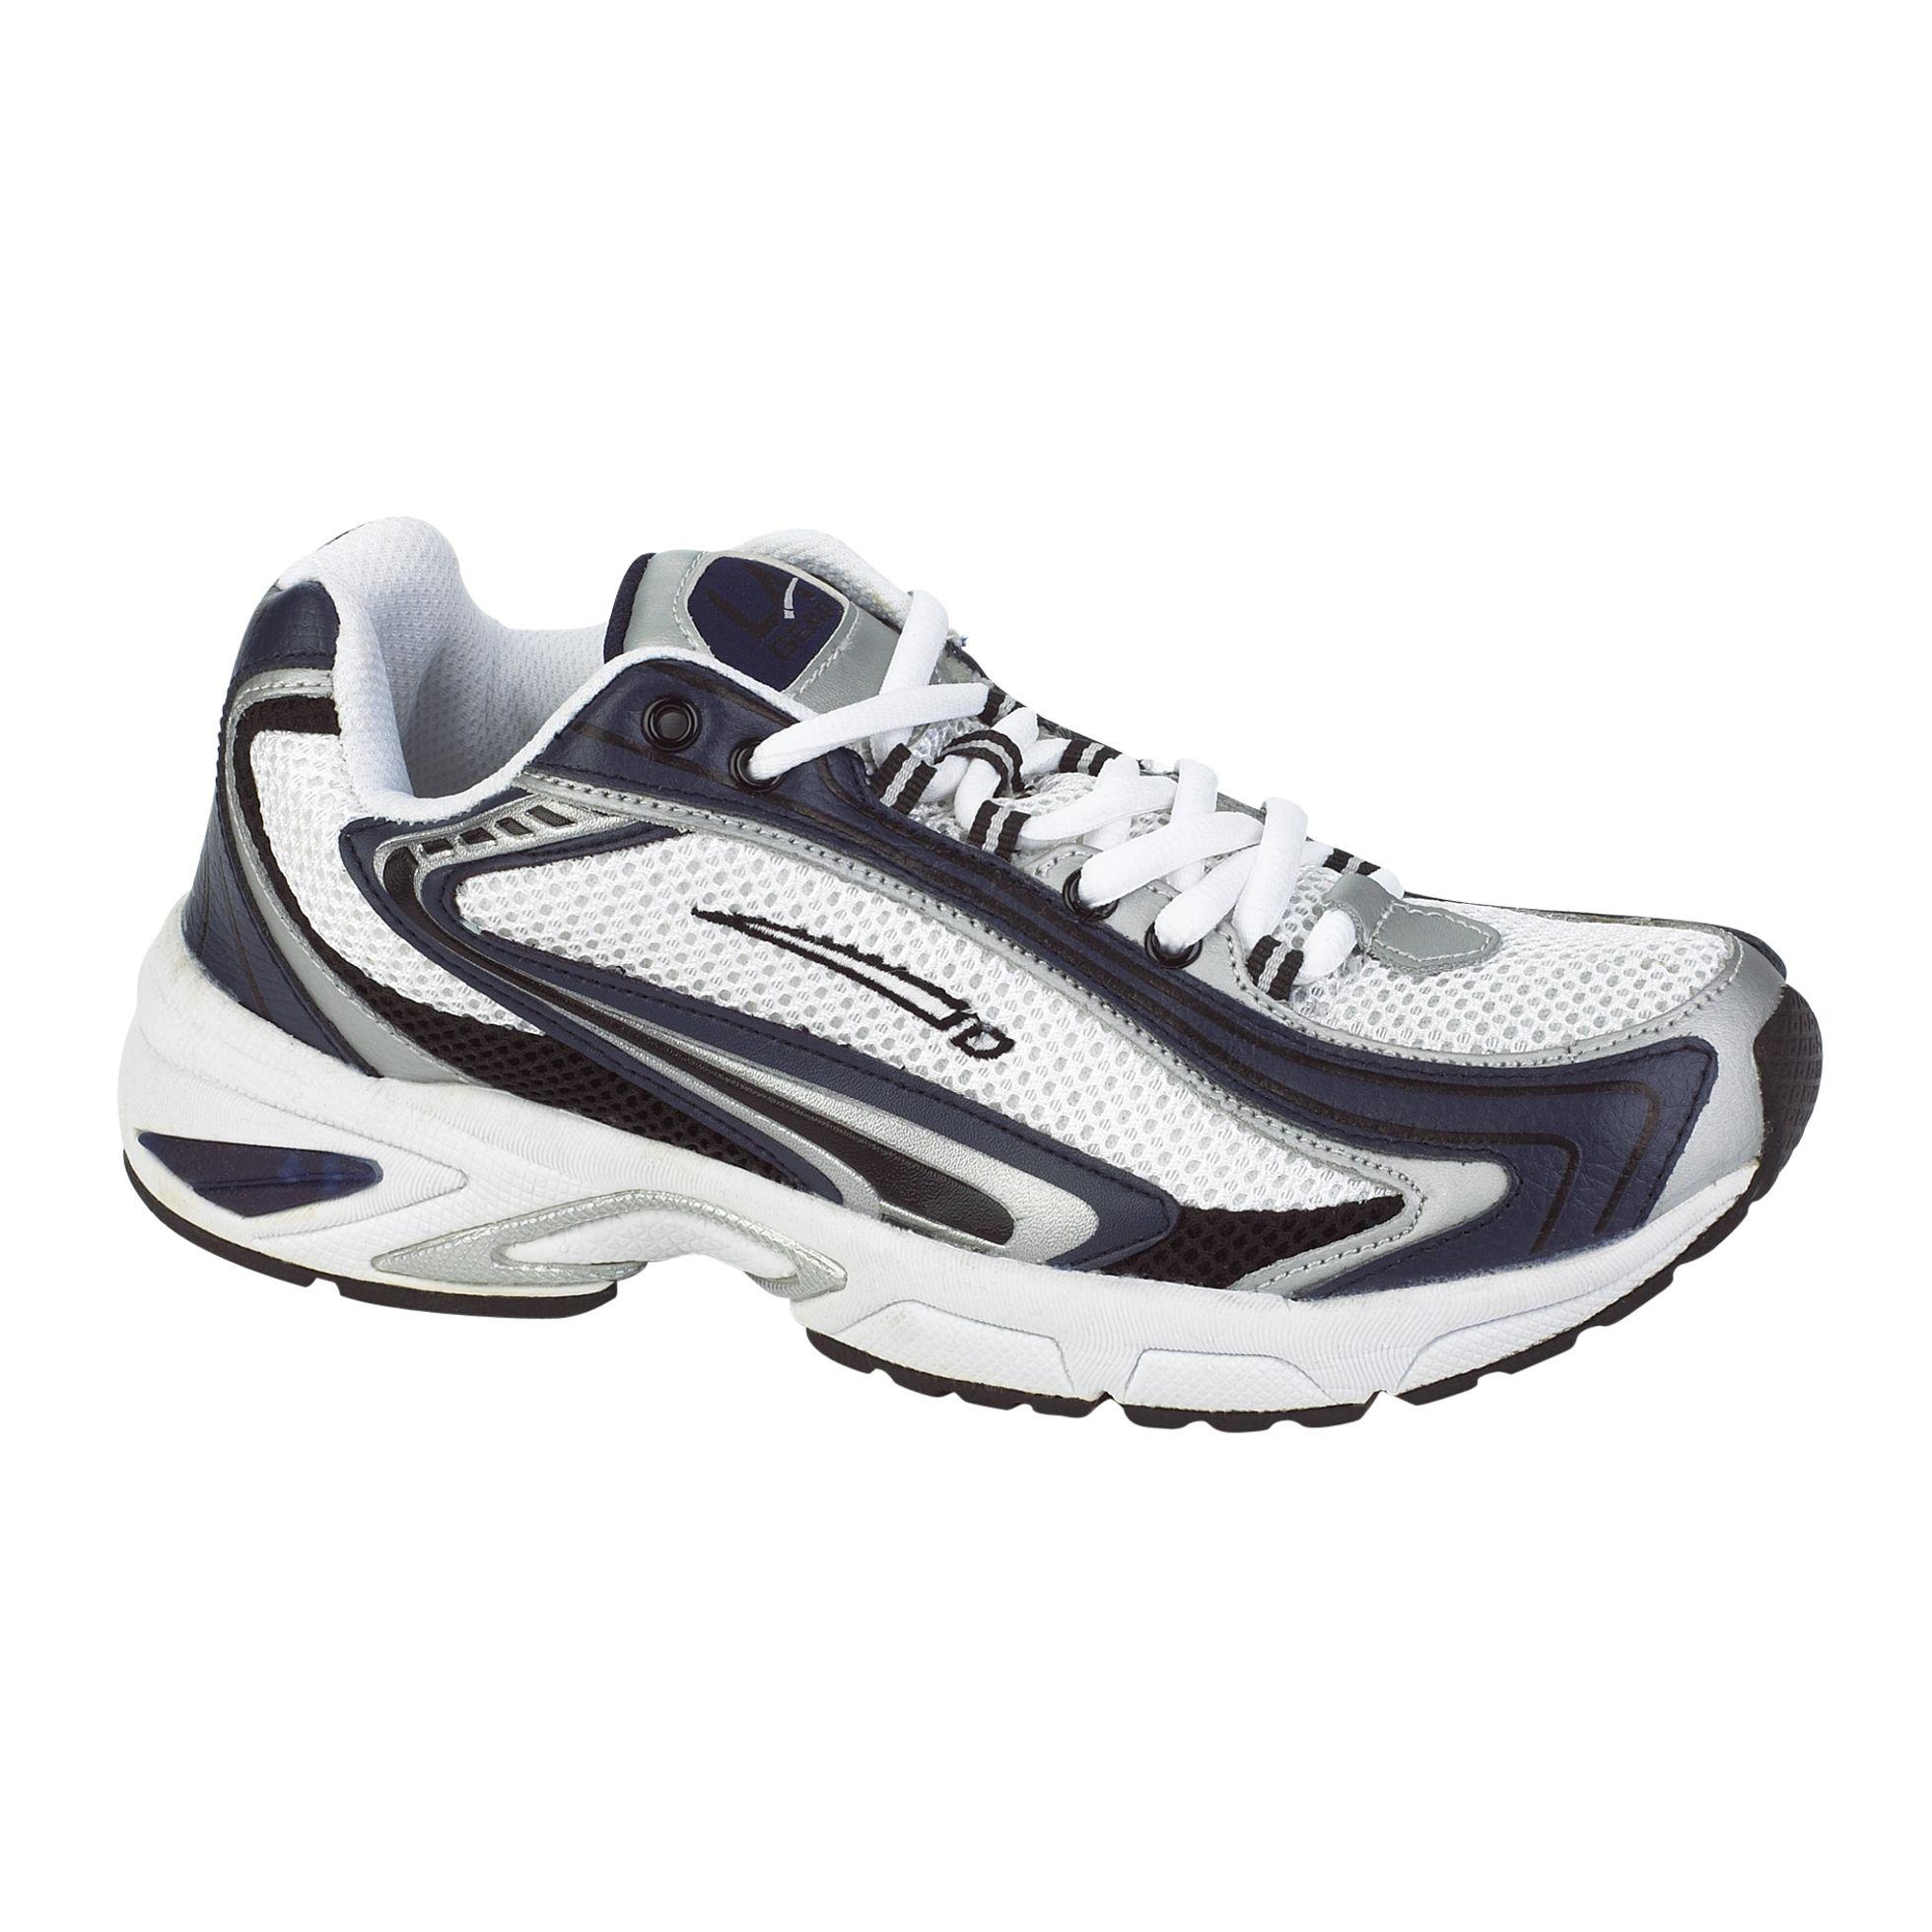 la gear s mario white black navy clothing shoes